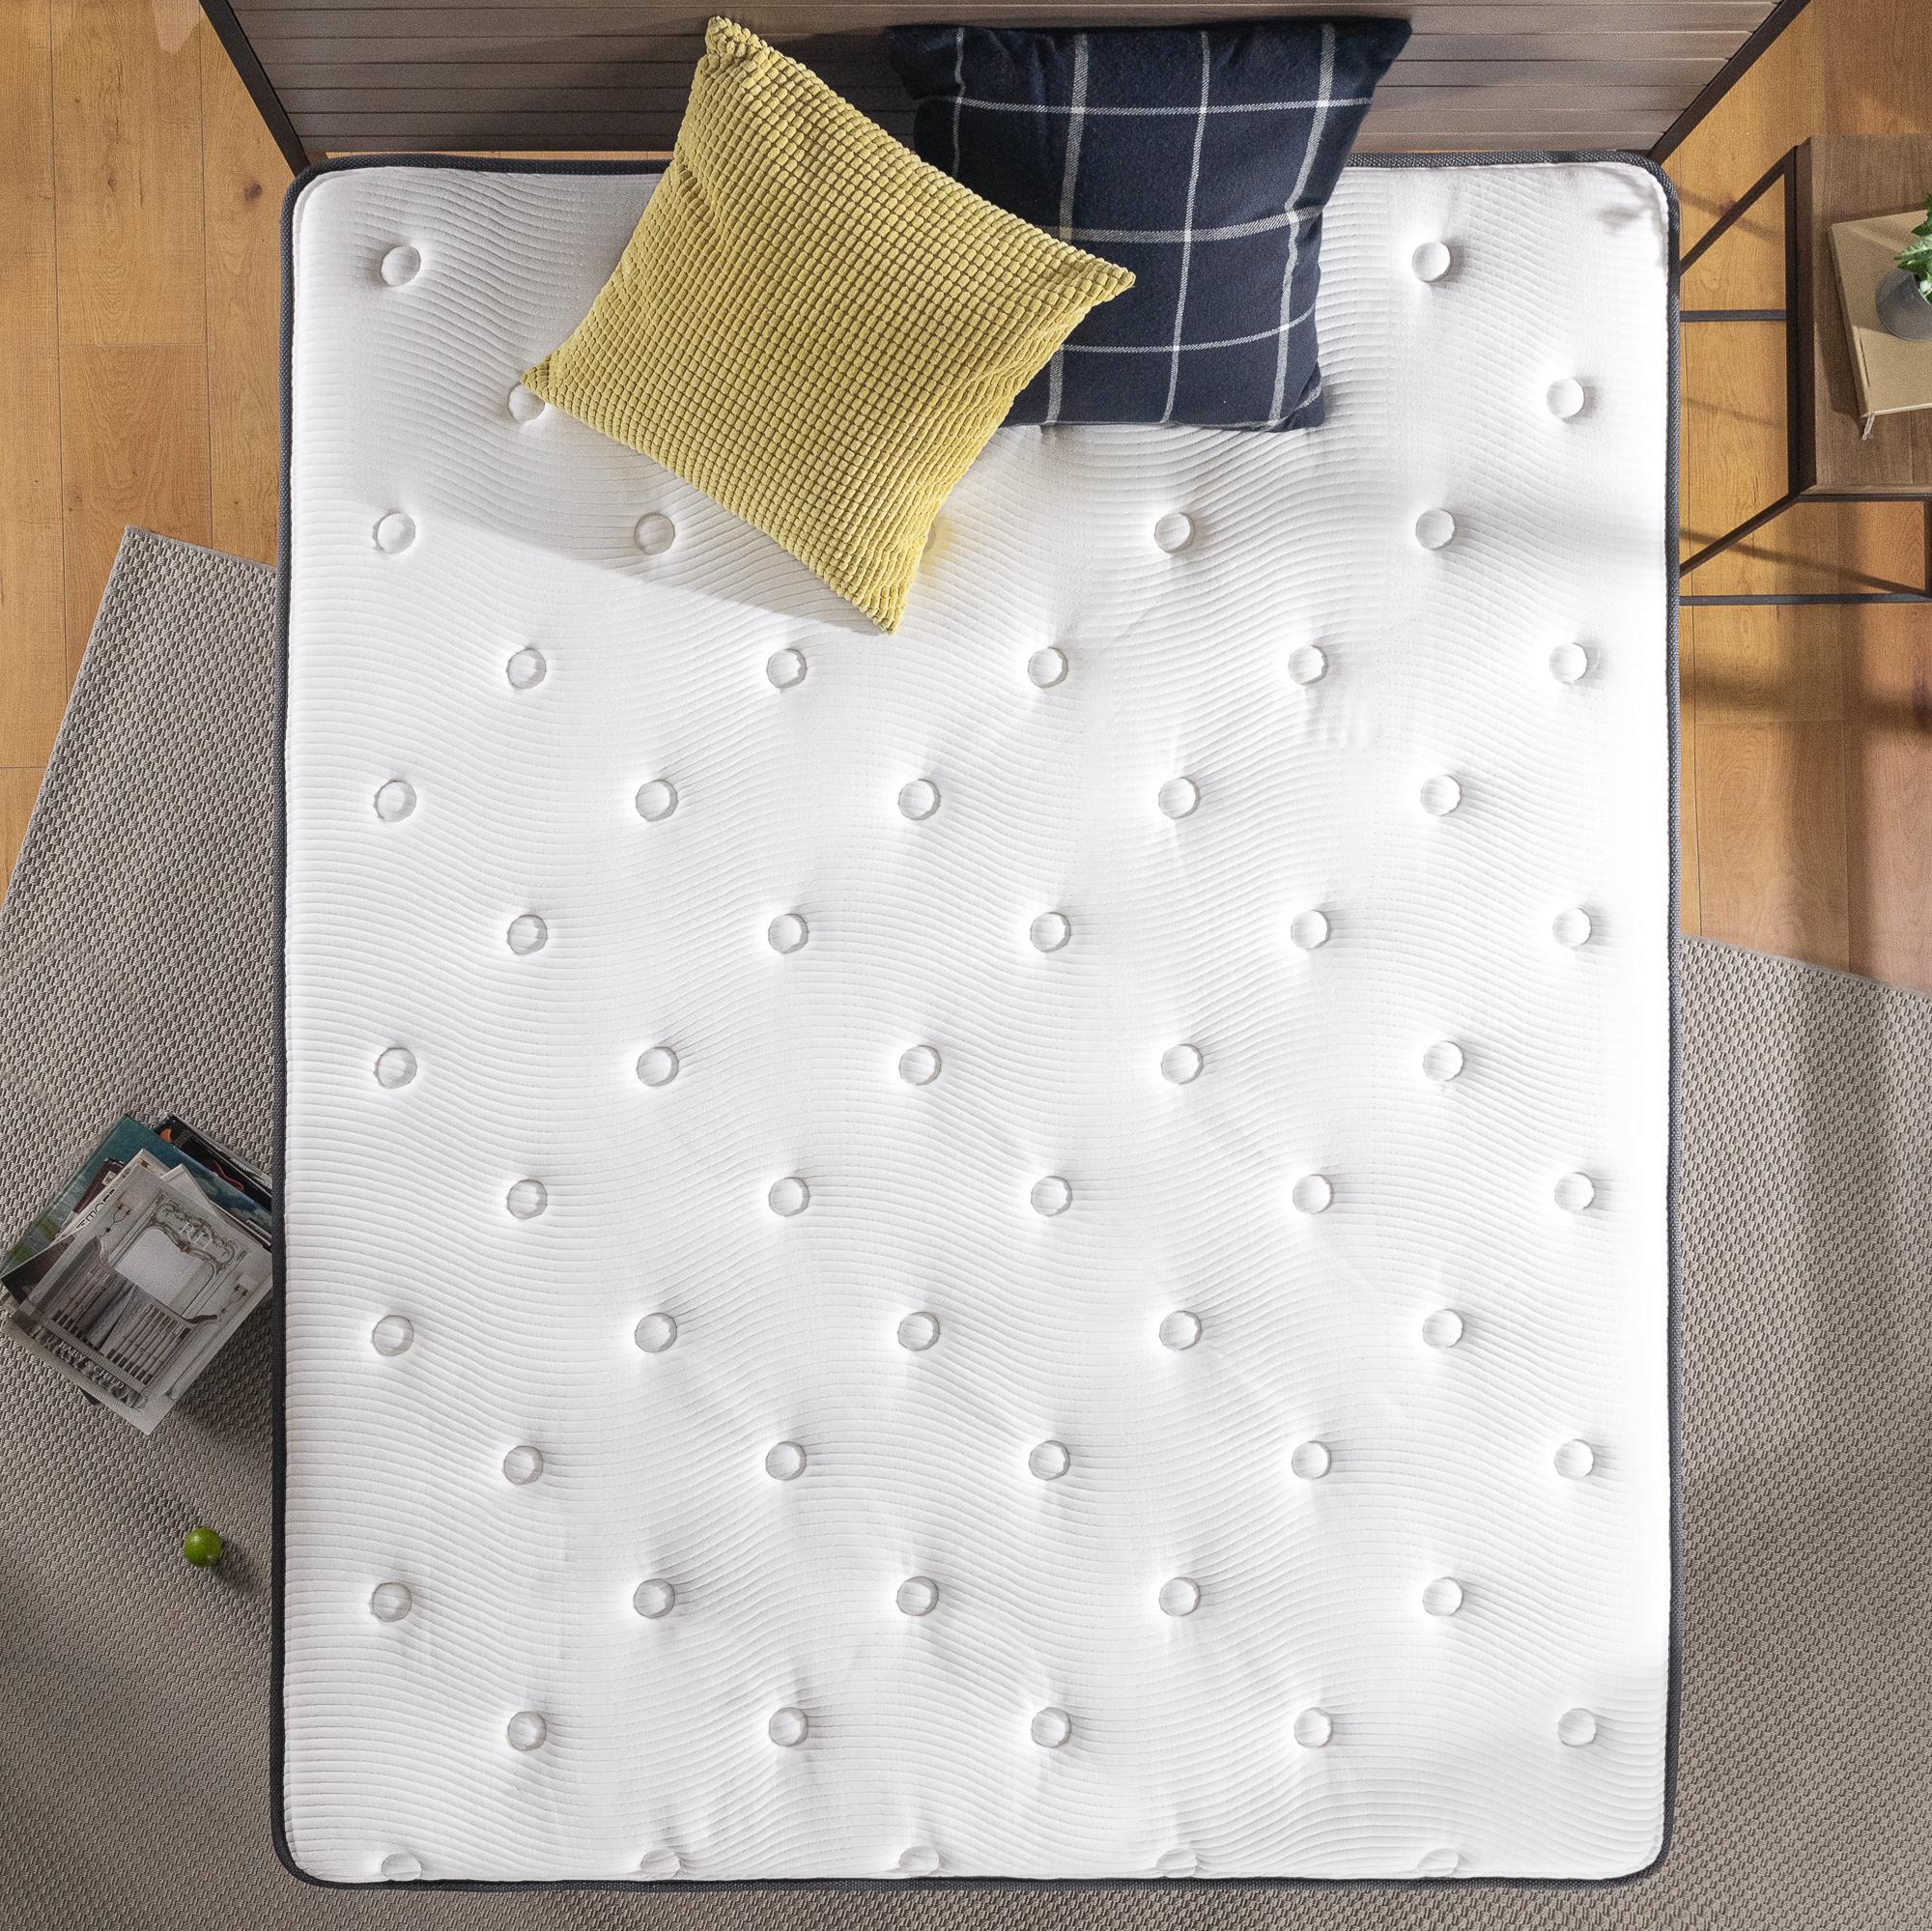 thumbnail 116 - Zinus Mattress Queen Double King Single Bed Memory Foam Pocket Spring Hybrid